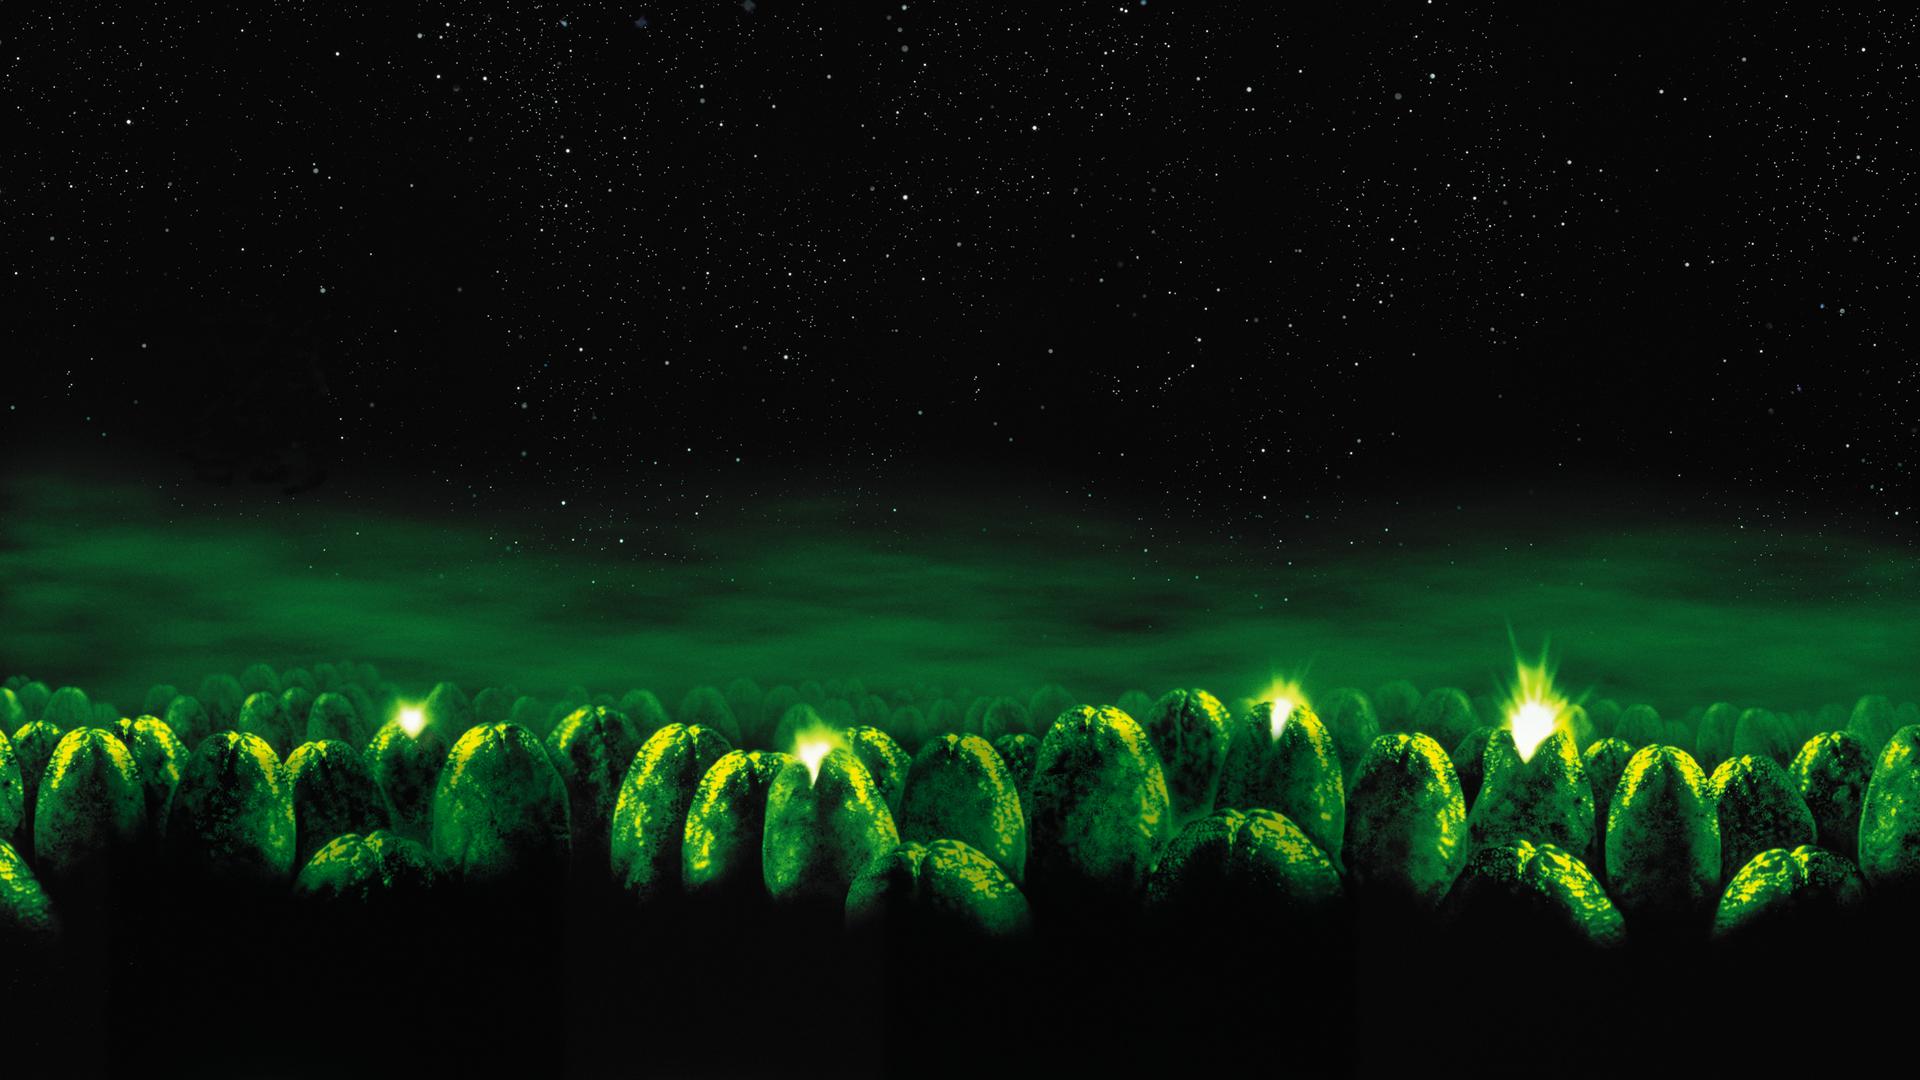 Alien wallpaper 1920x1080 1   hebusorg   High Definition Wallpapers 1920x1080